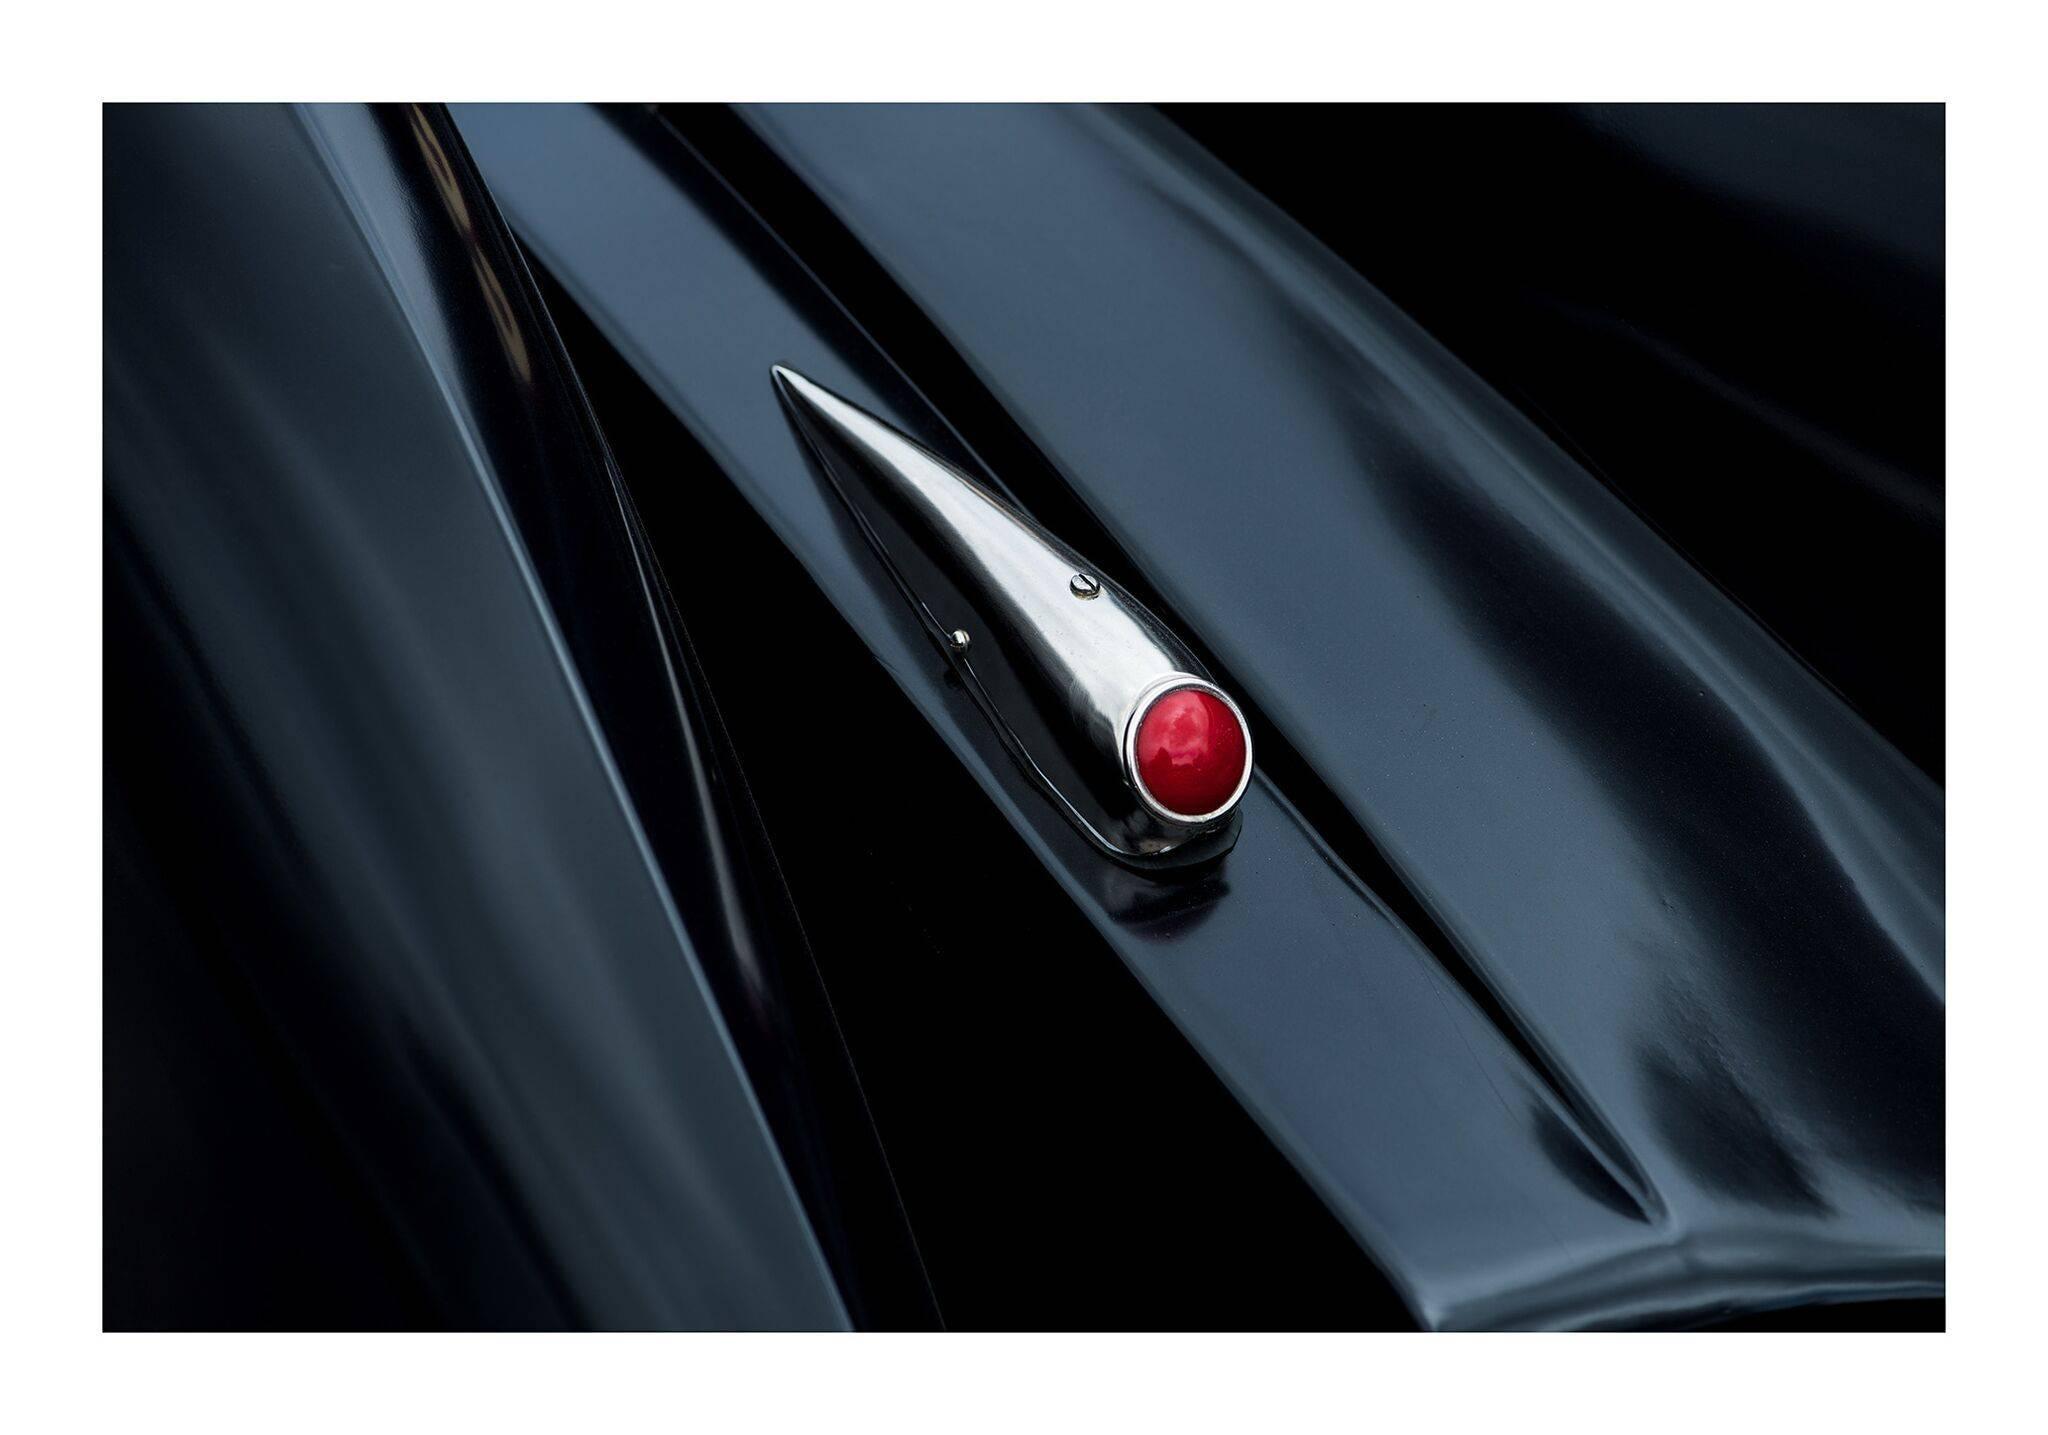 1930 Hotchkiss AM80 2995cc - contemporary black car lambda print